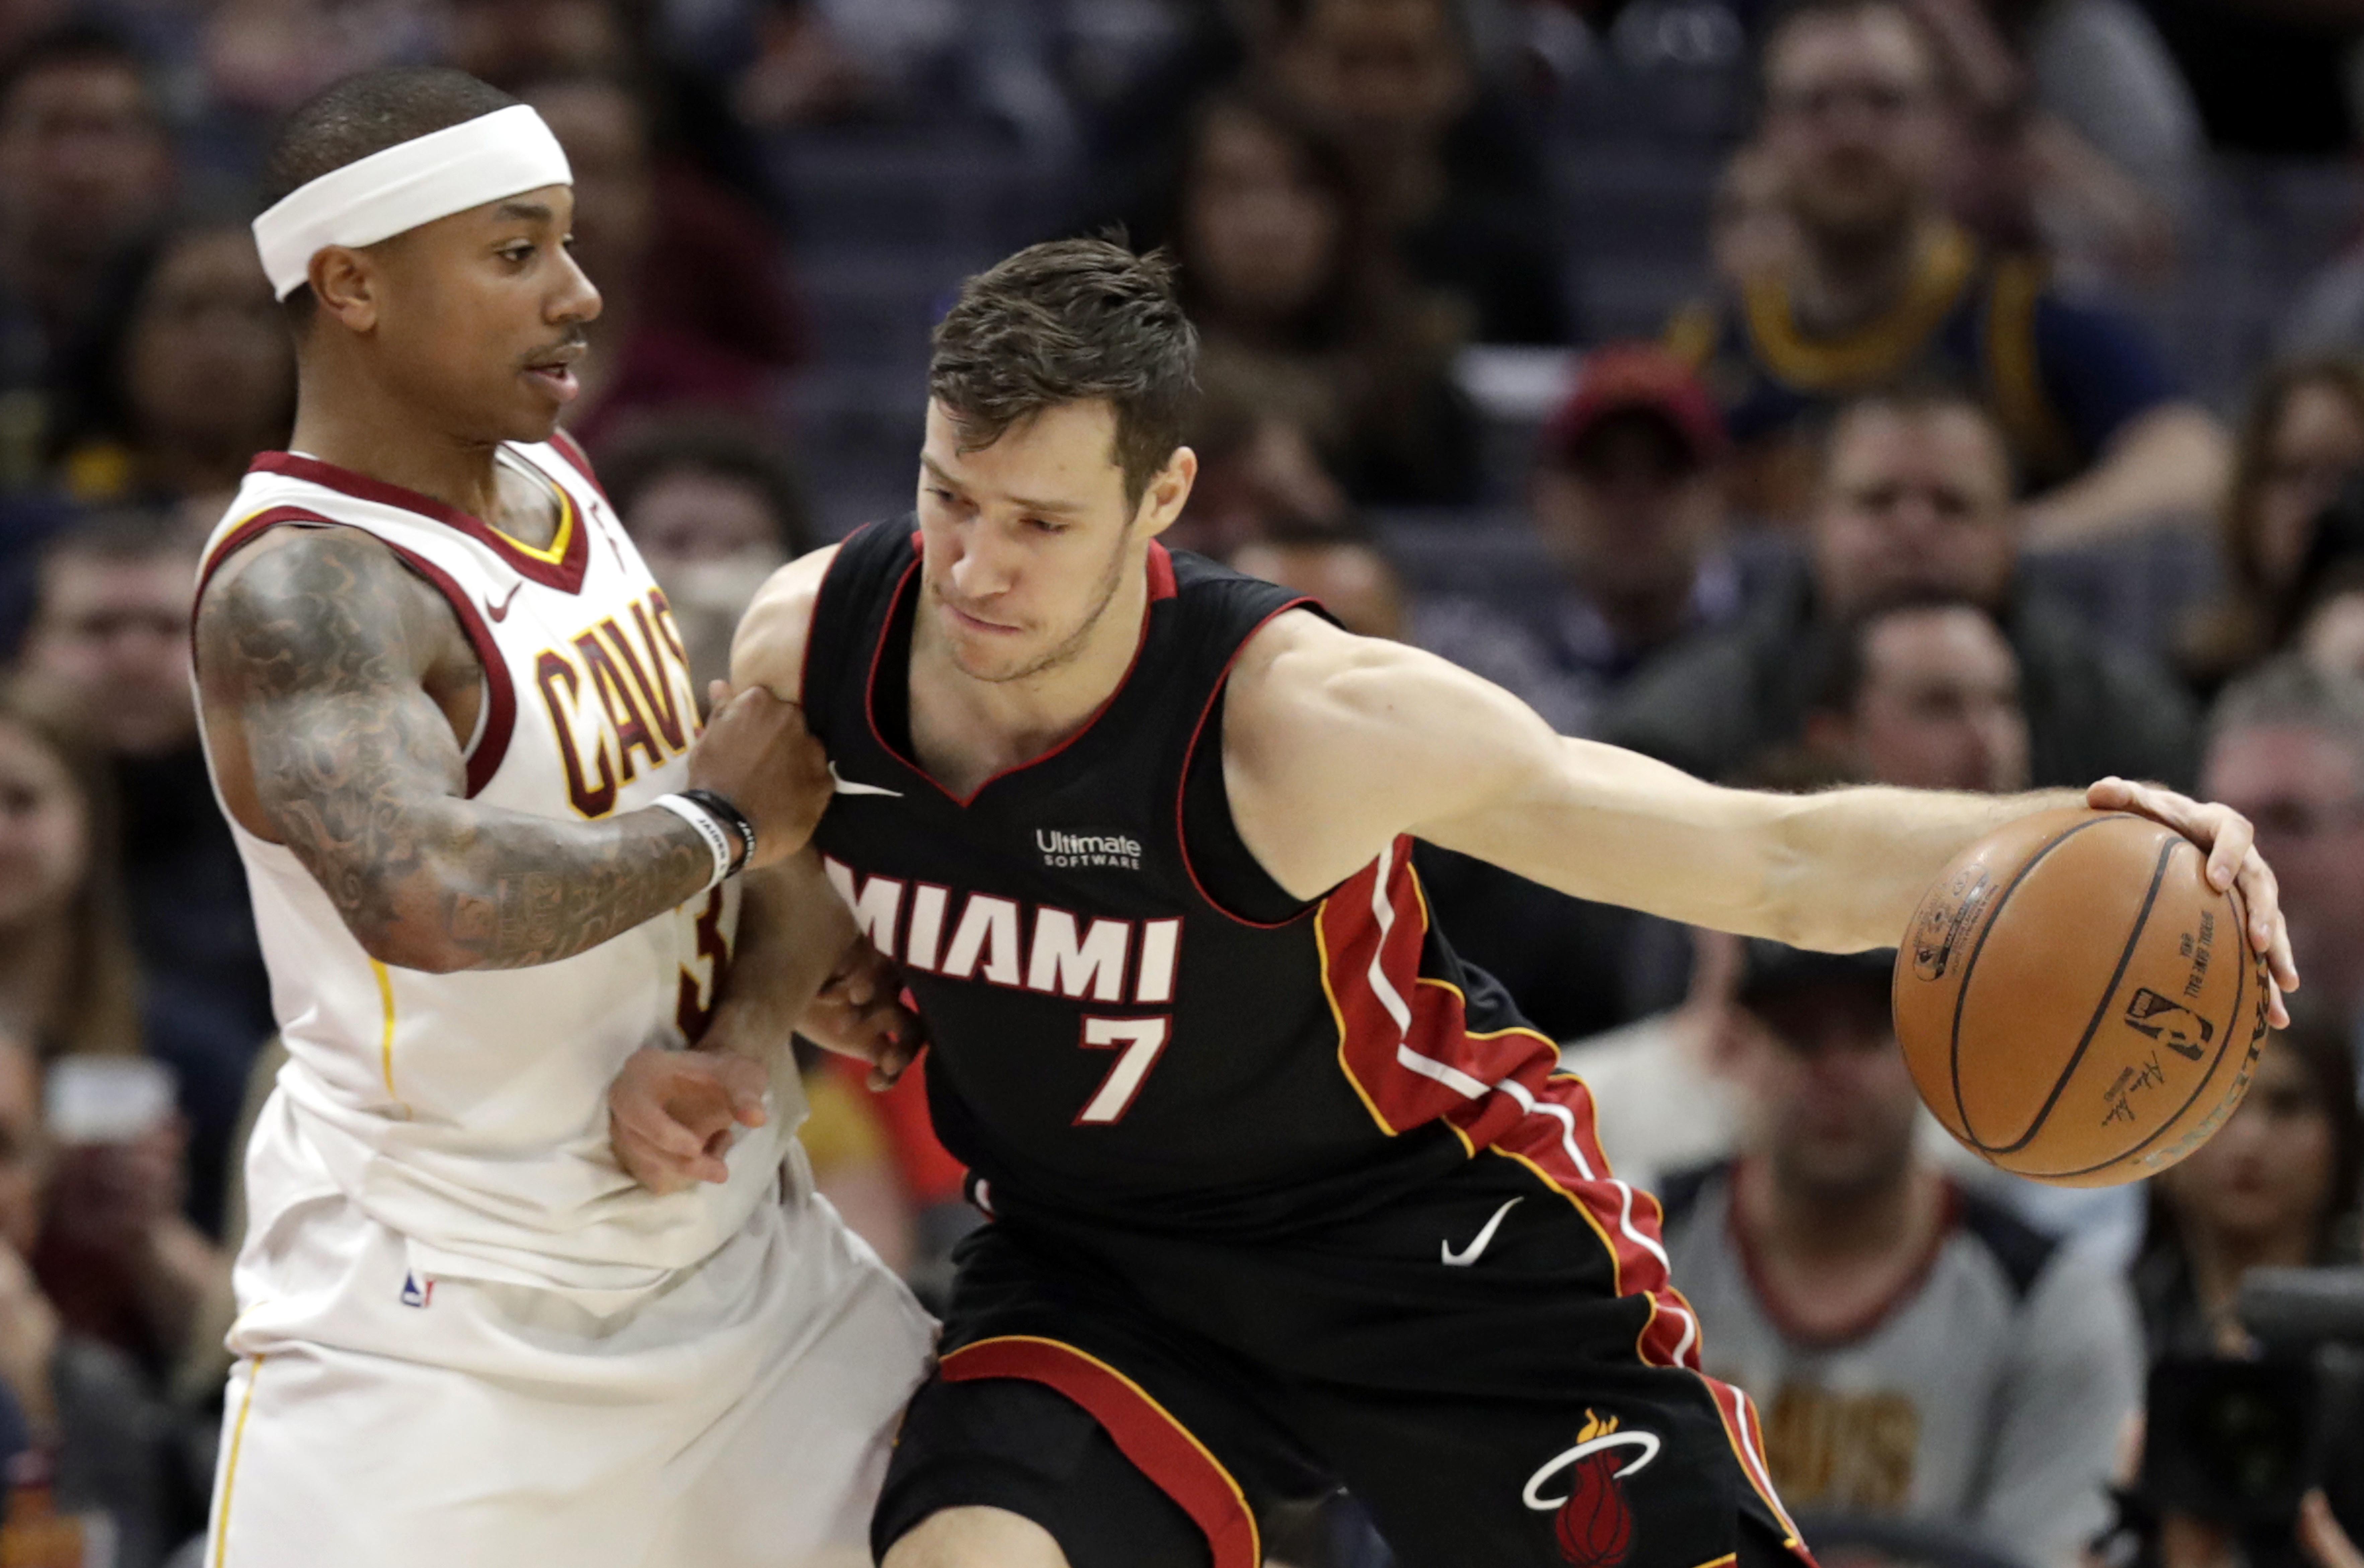 089da7c0e Miami Heat guard Goran Dragic (7) drives past the Cleveland Cavaliers   Isaiah Thomas